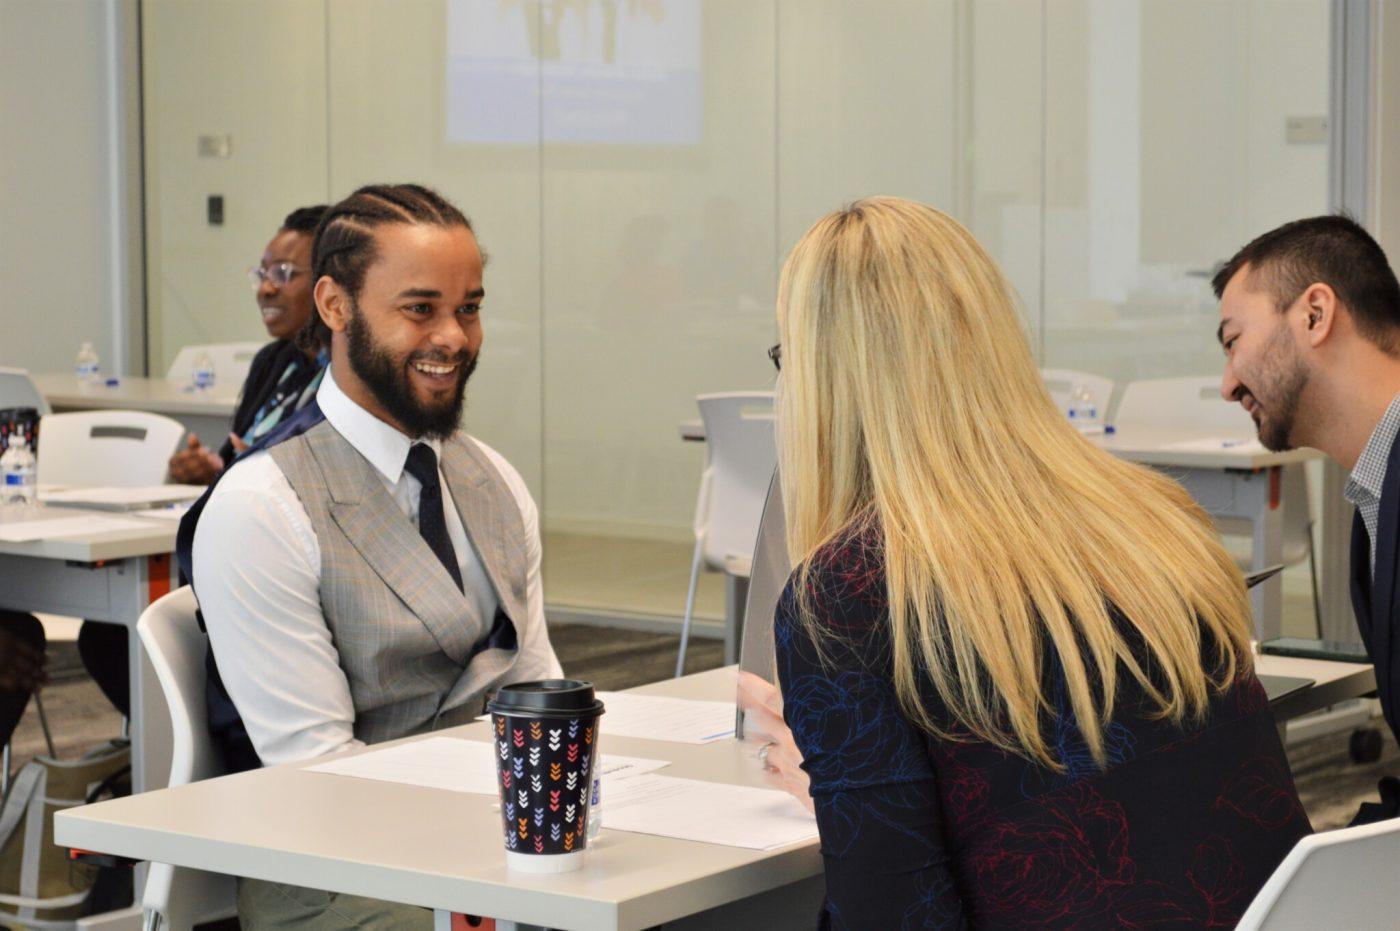 Job Training Graduate Interviewing